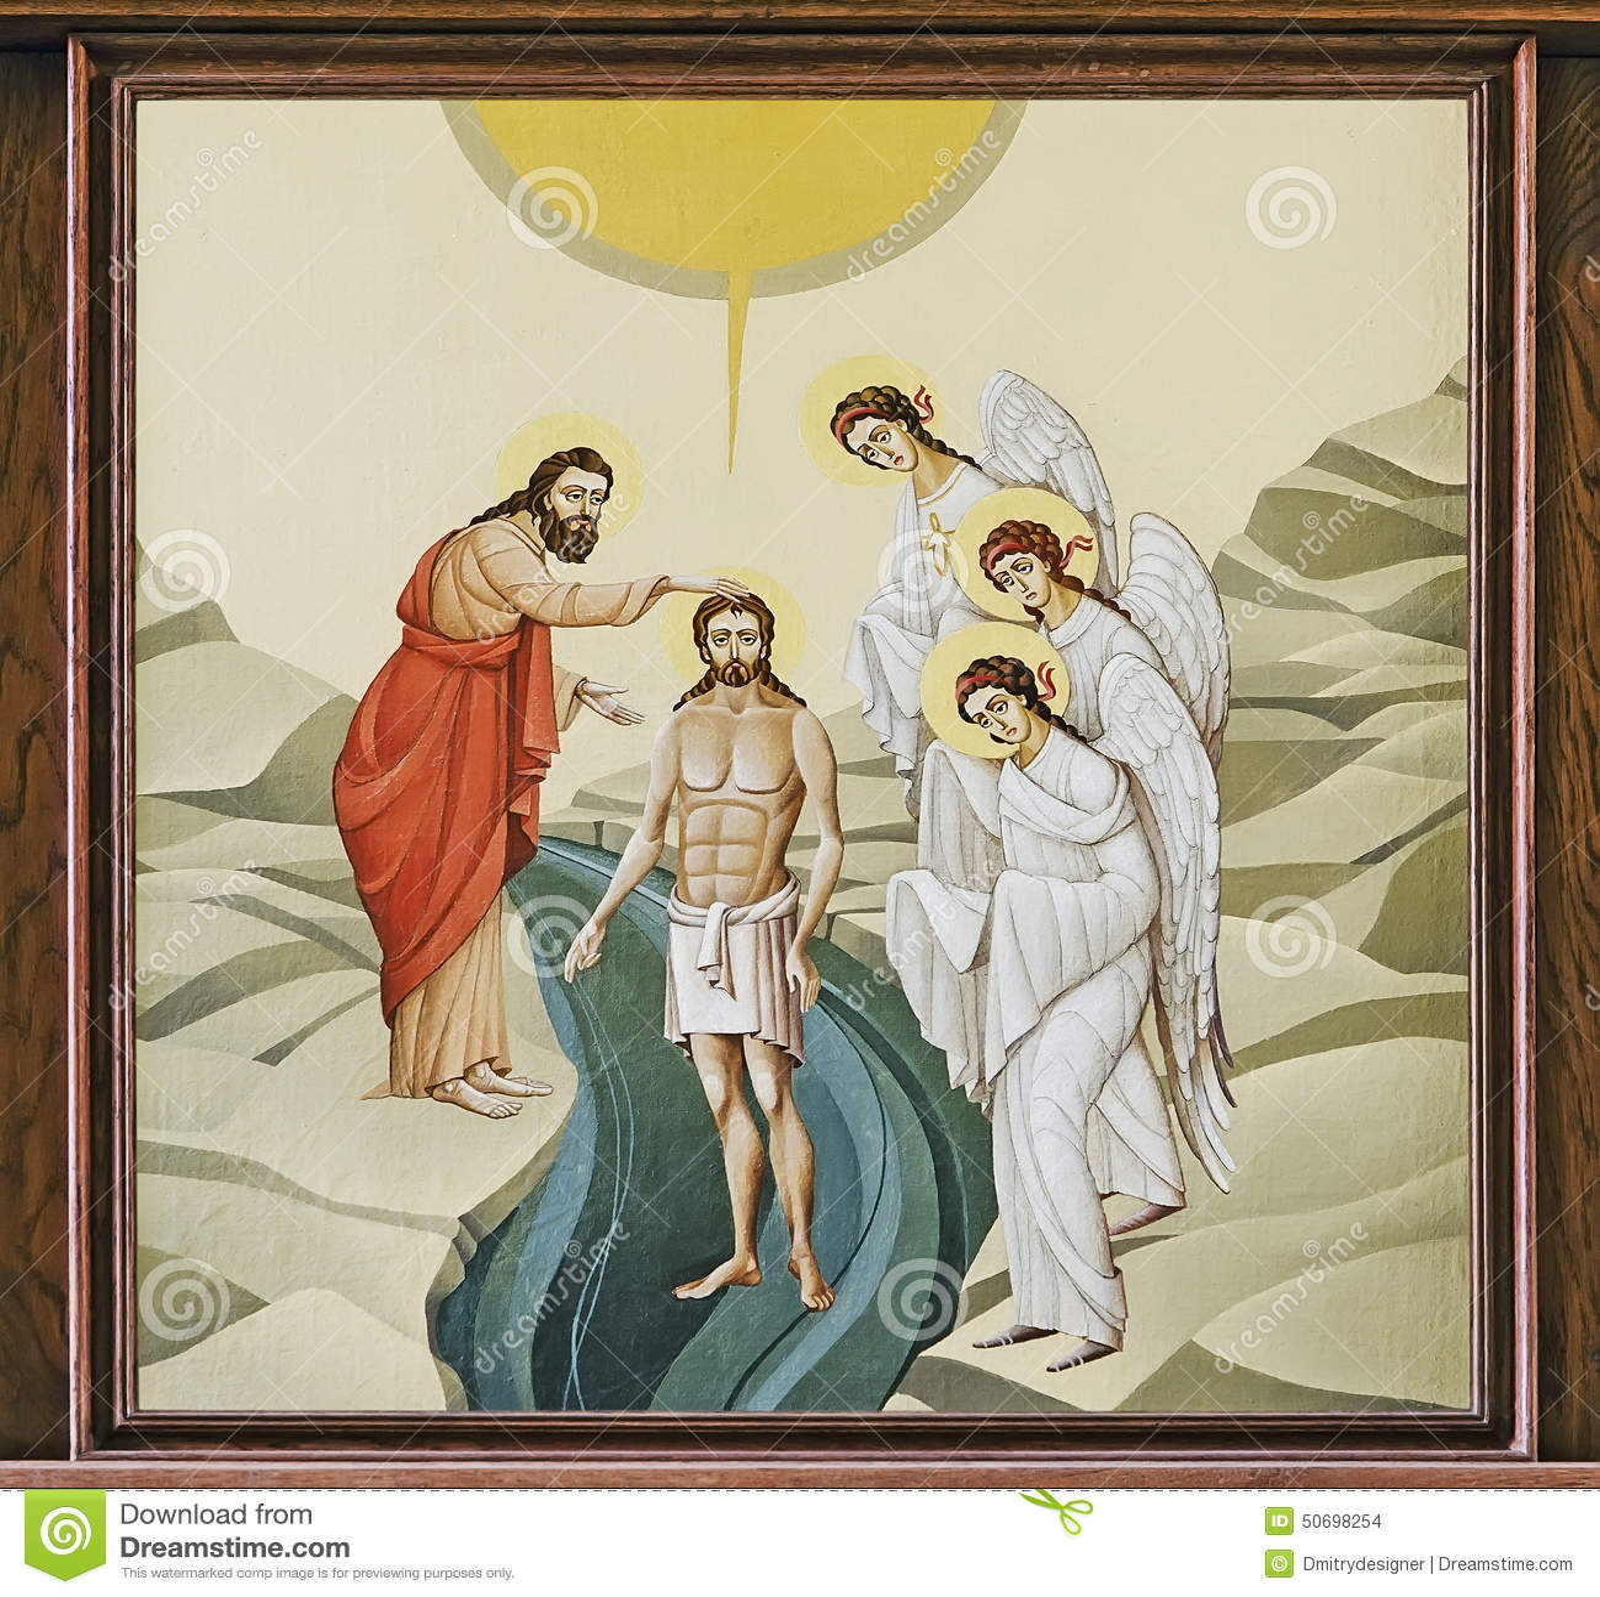 baptism of jesus illustration stock illustration image 65074485